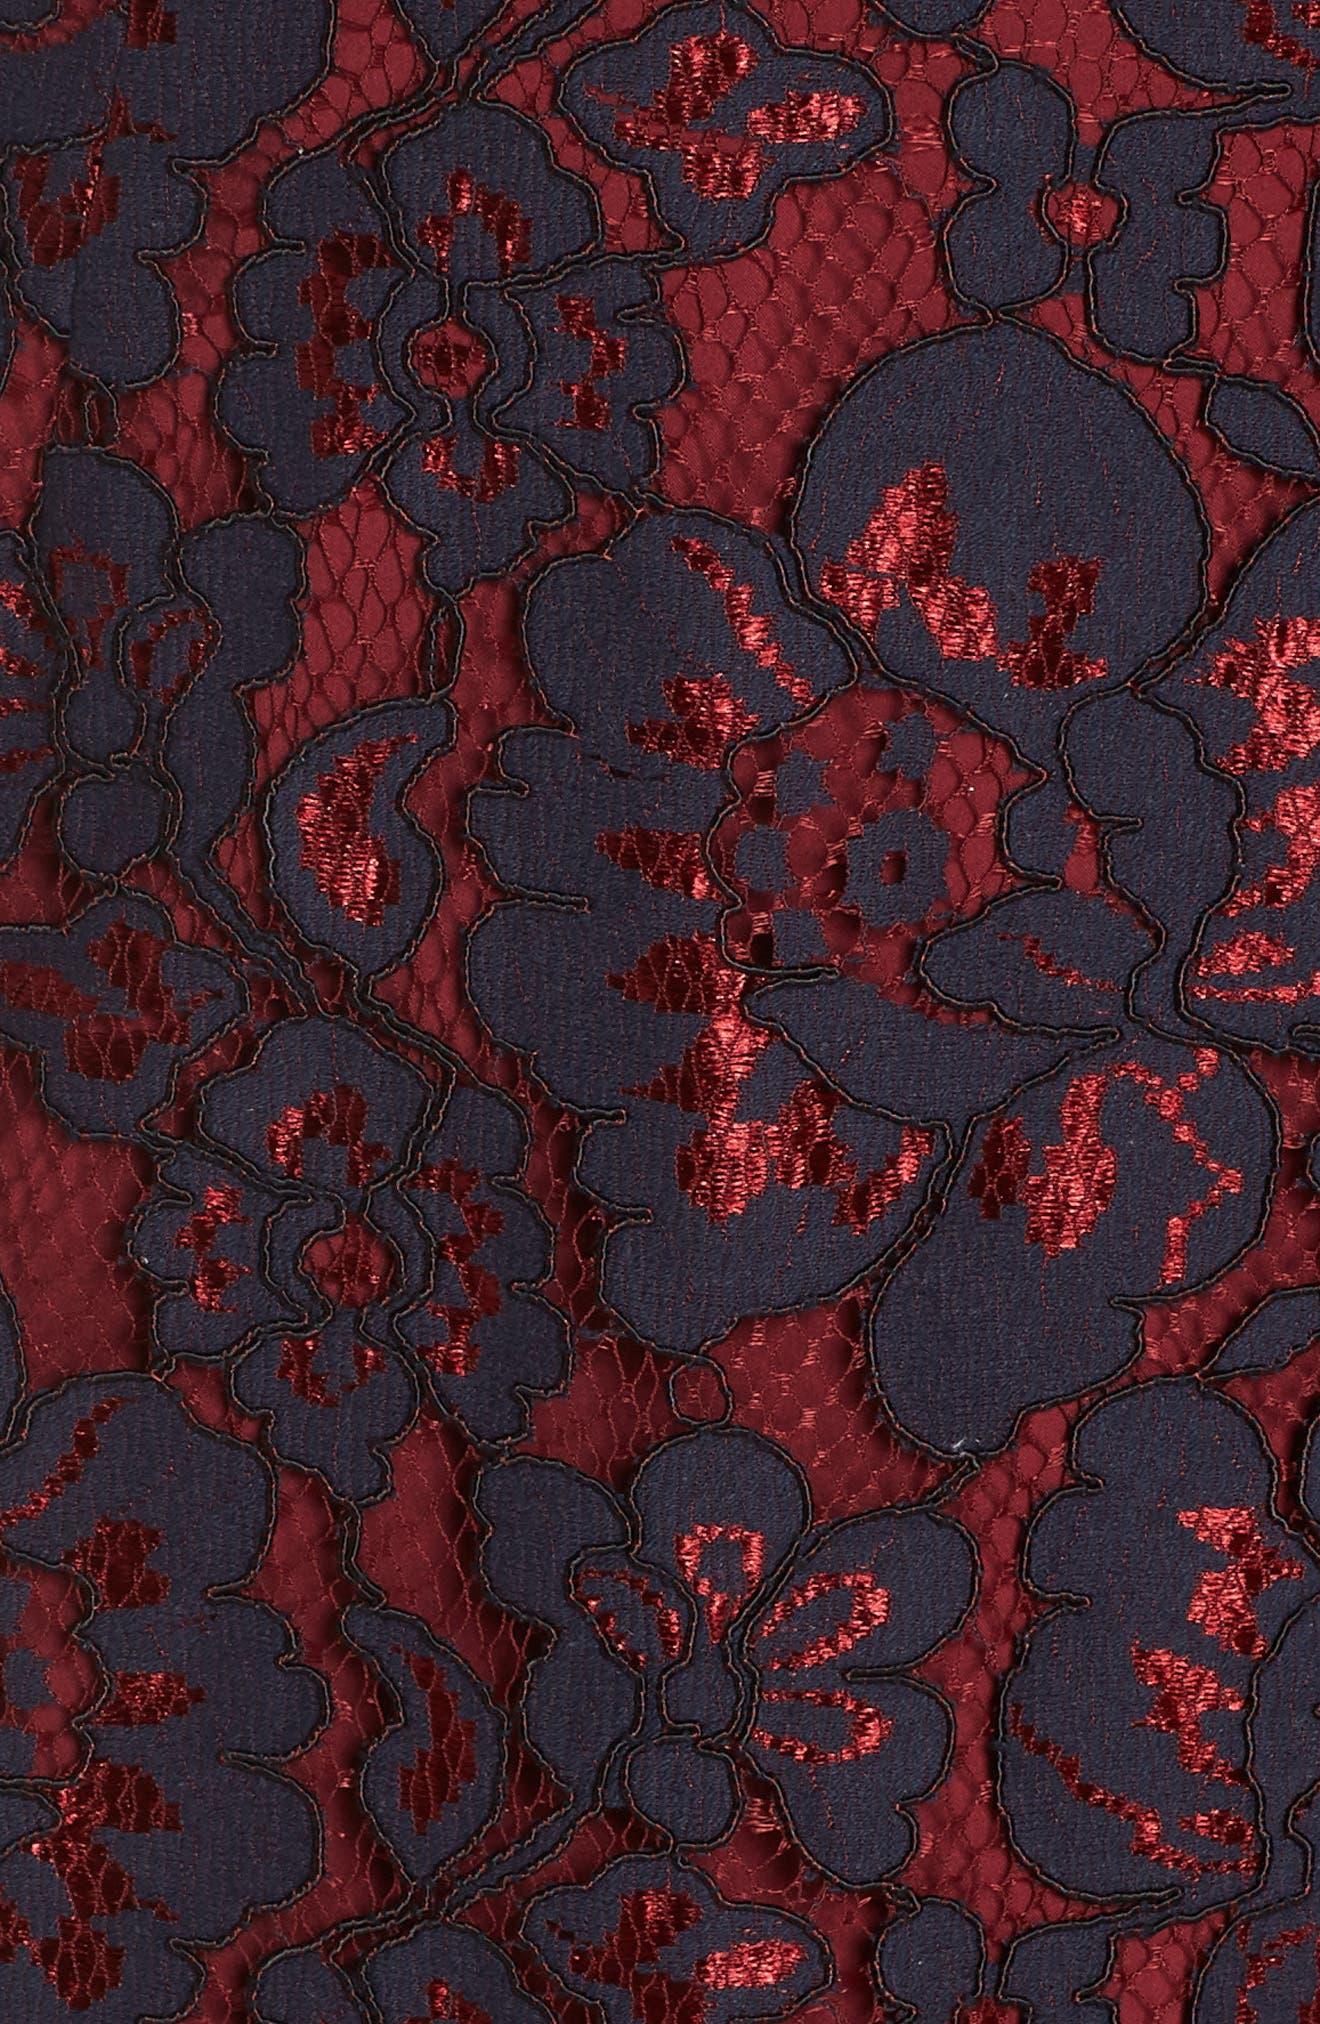 Lace Sheath Dress,                             Alternate thumbnail 6, color,                             NAVY/ WINE LACE